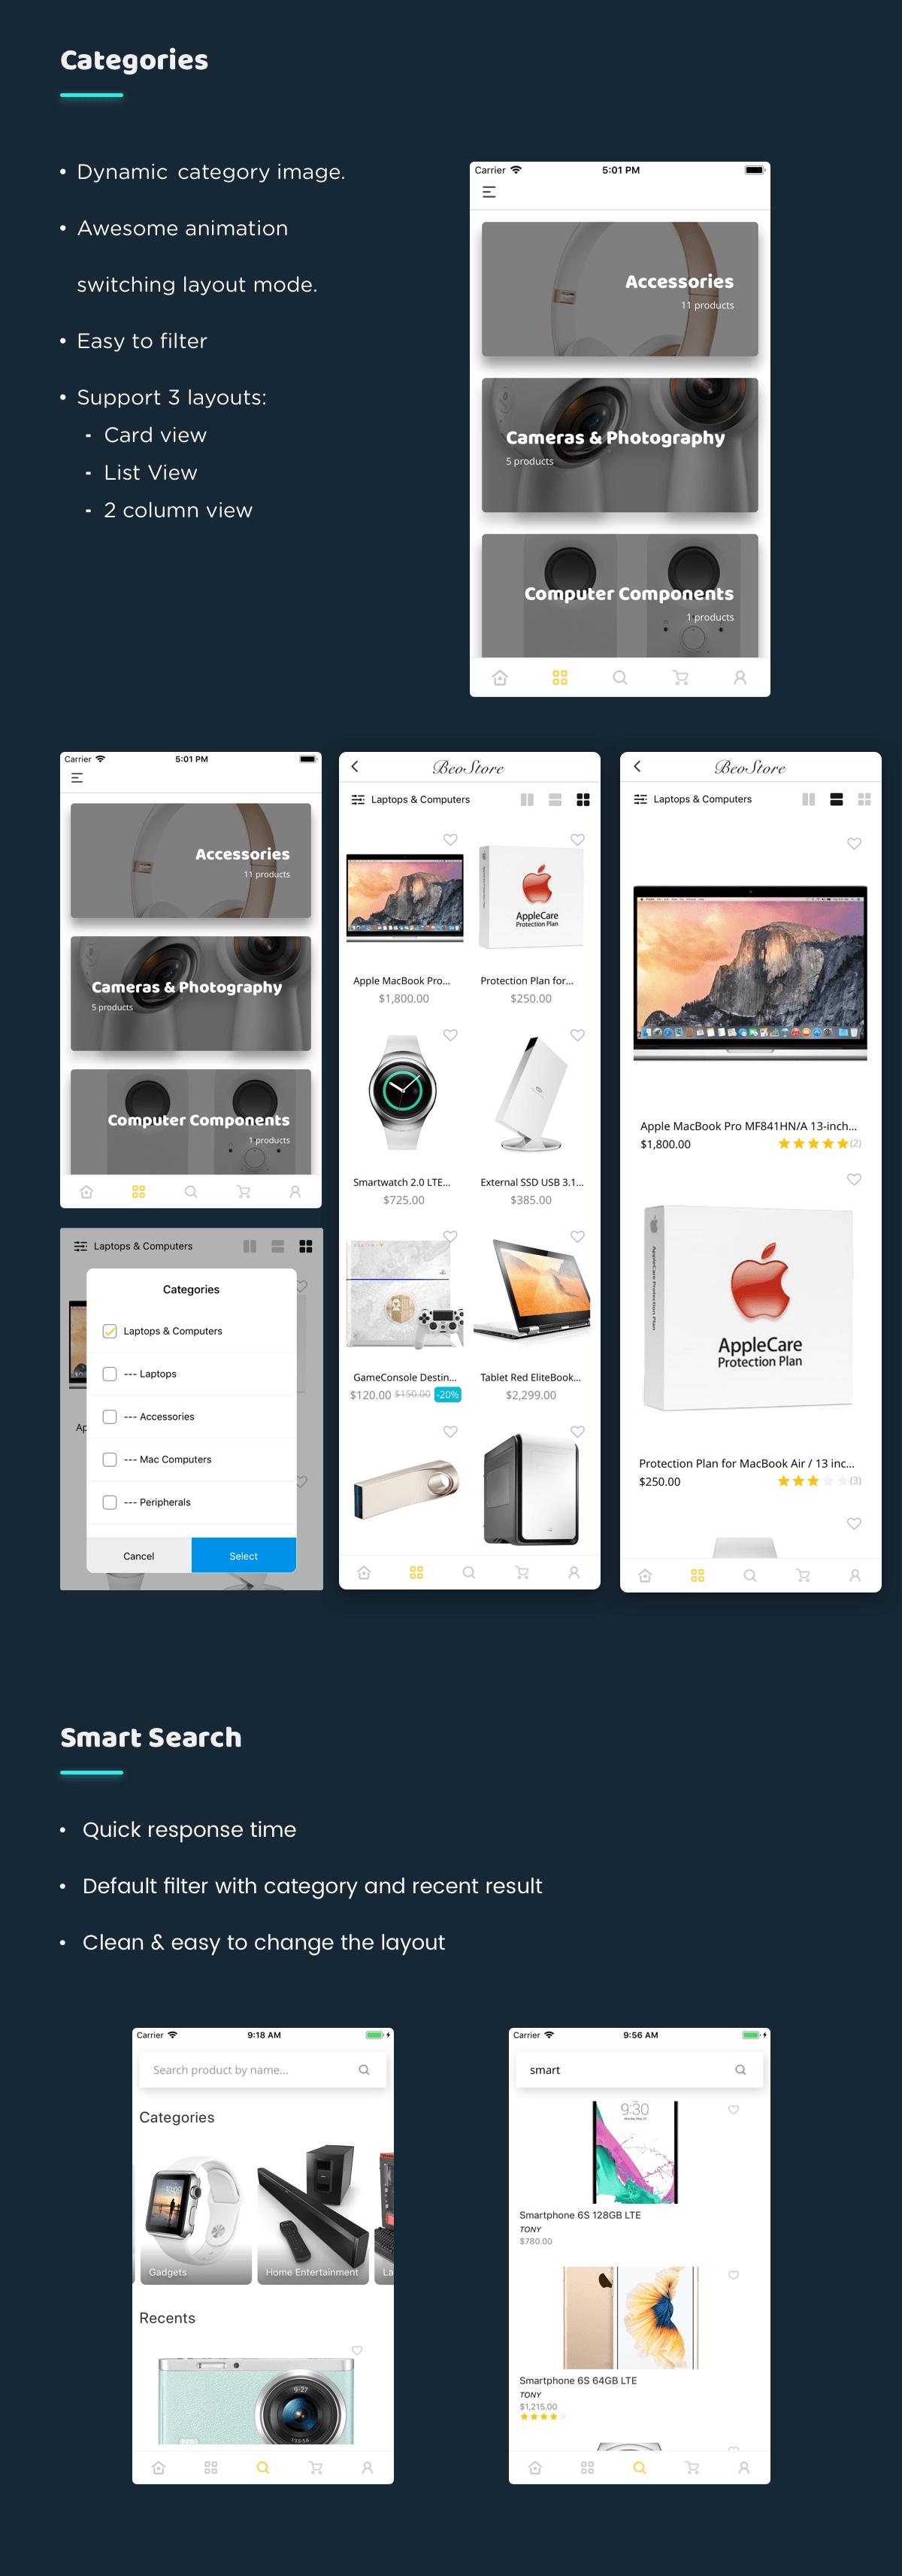 687474703a2f2f6d73746f72652e696f2f77702d636f6e74656e742f75706c6f6164732f323031382f30372f63617465676f726965732e706e67 - سورس اپلیکیشن MStore pro Multi vendor | اپلیکیشن ووکامرس و دکان ( android / Ios )